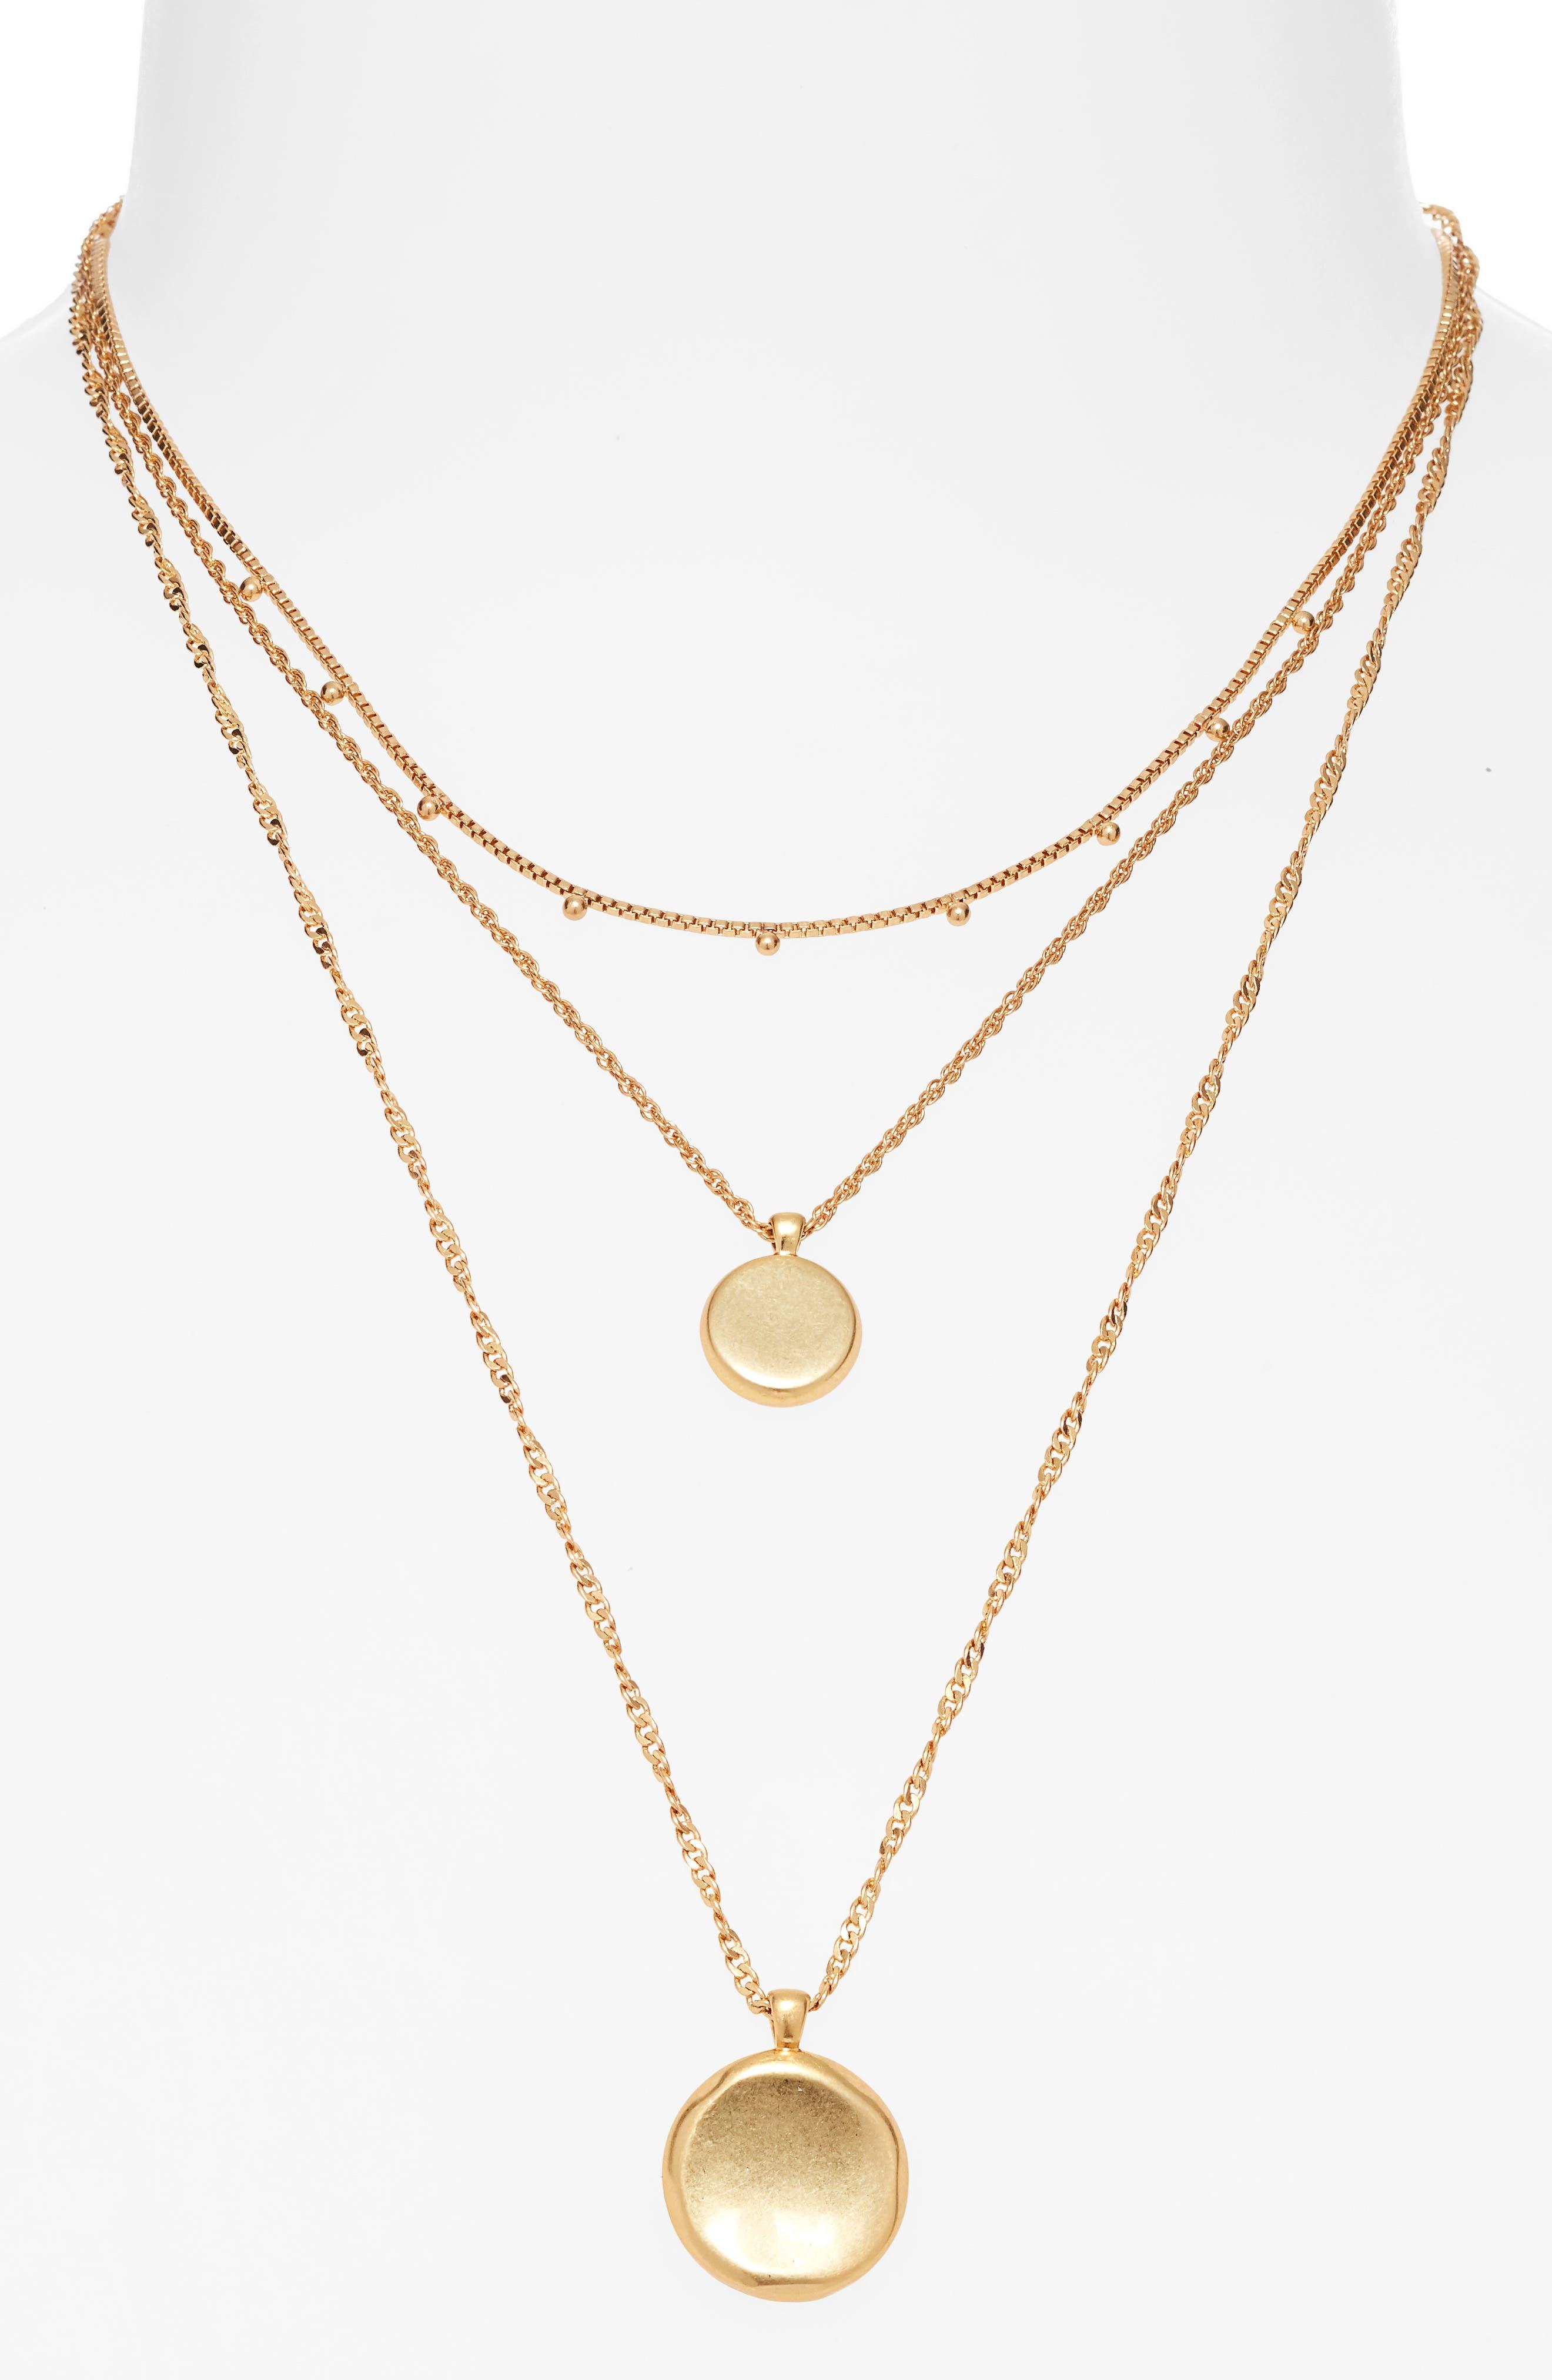 Kwan Crystal Love Pendant Multi Layered Necklace Cross